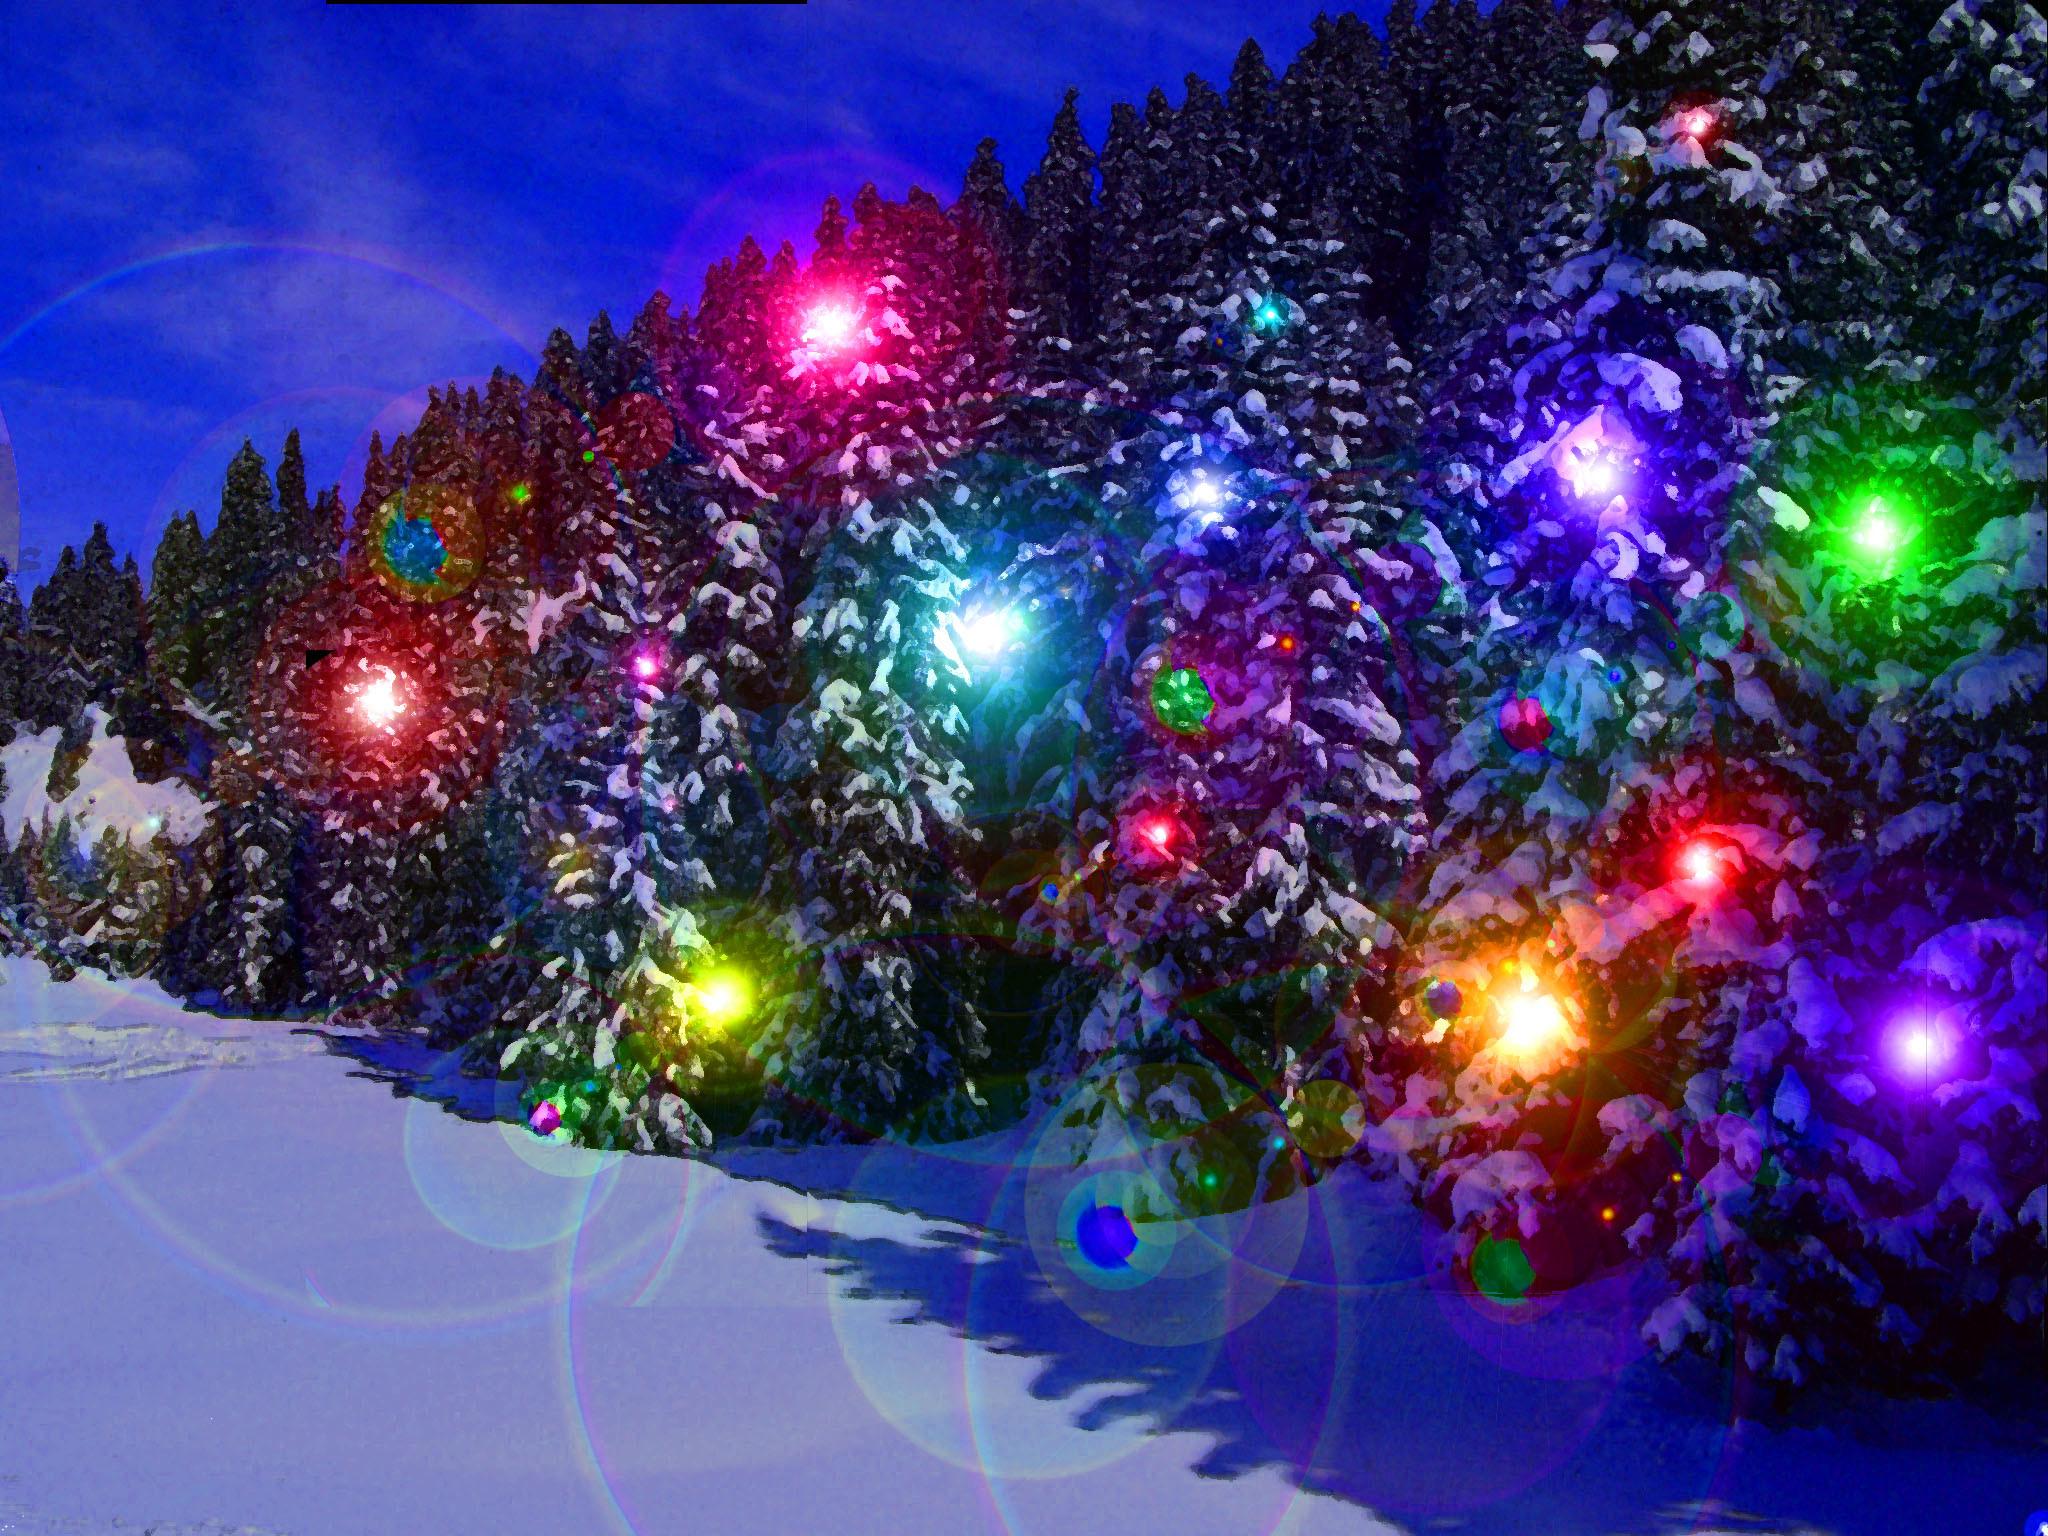 Christmas Lights Wallpapers ~ Toptenpack.com